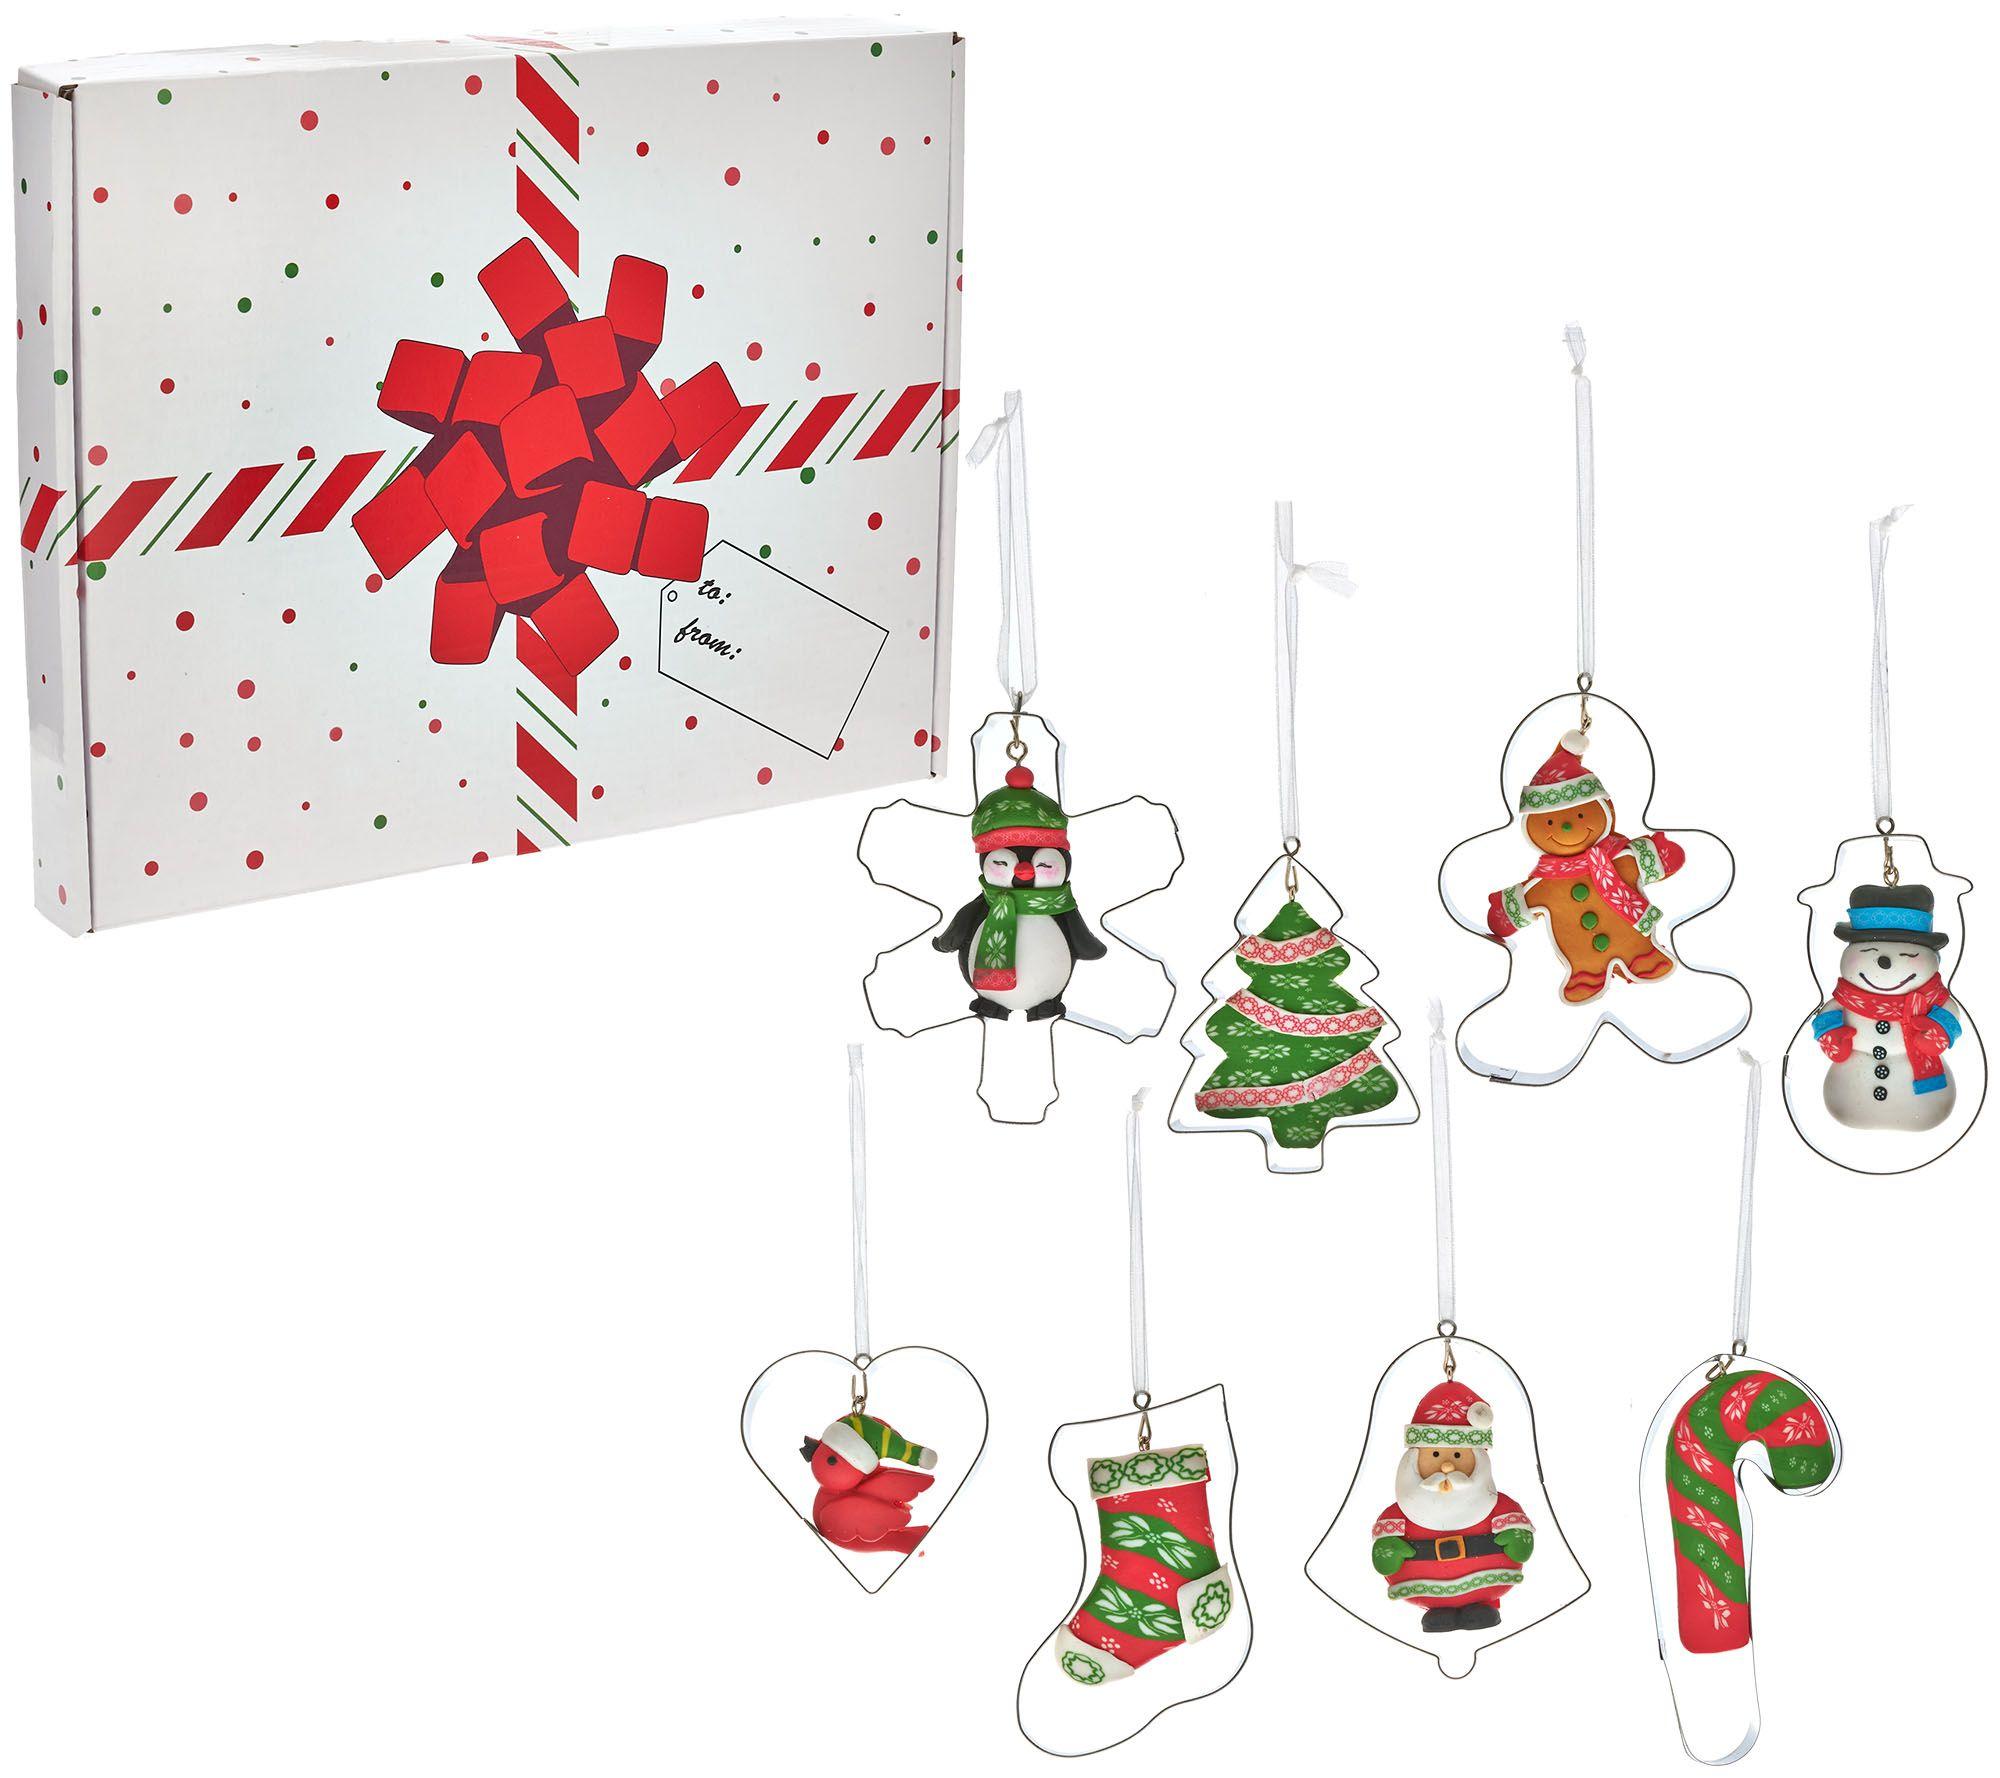 Qvc Christmas Decorations Clearance | Psoriasisguru.com